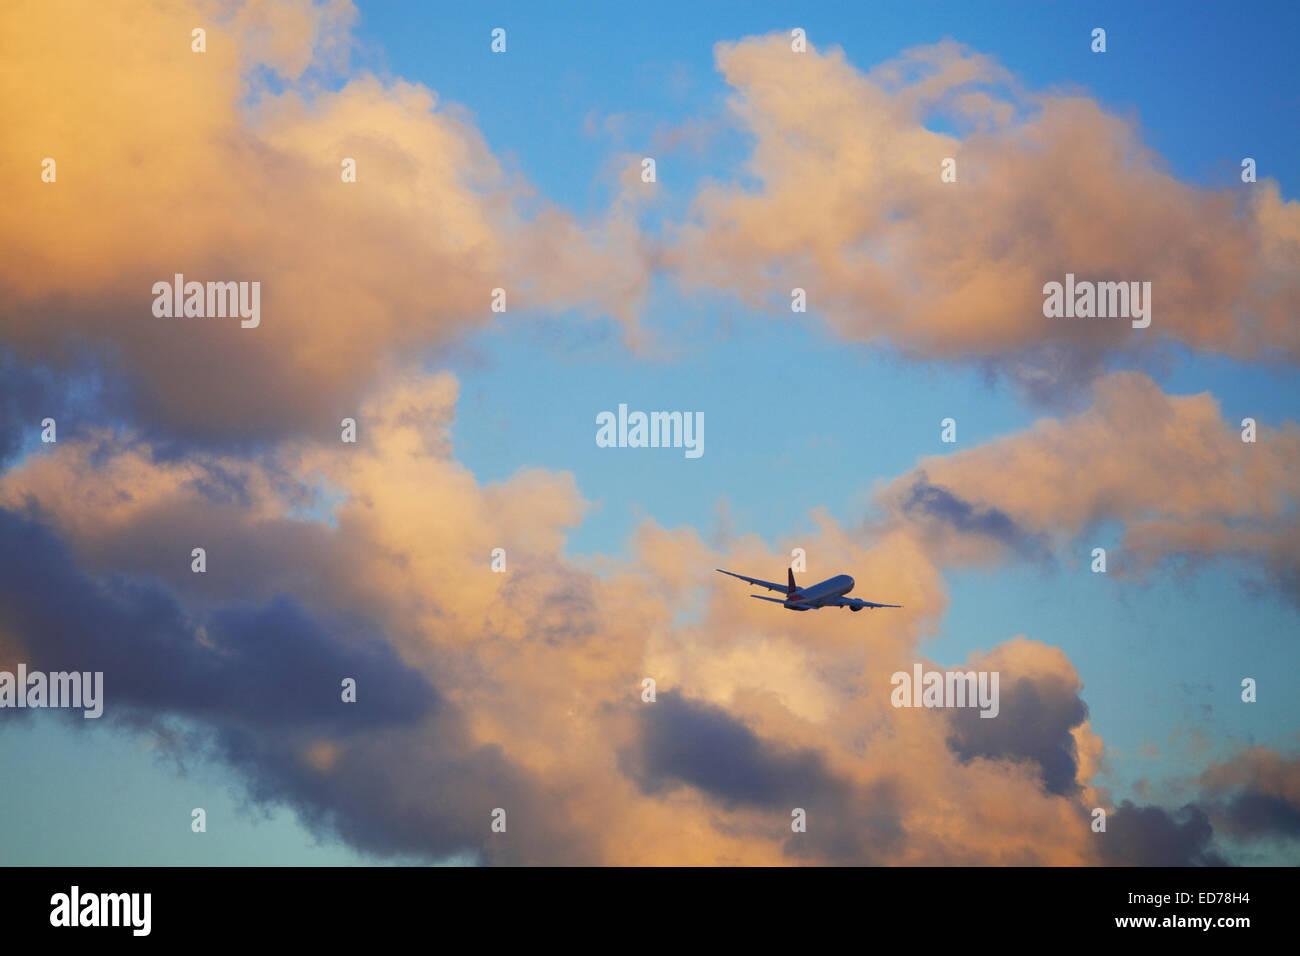 Verkehrsflugzeug im Flug in der Nähe von Miami, Florida, USA Stockbild